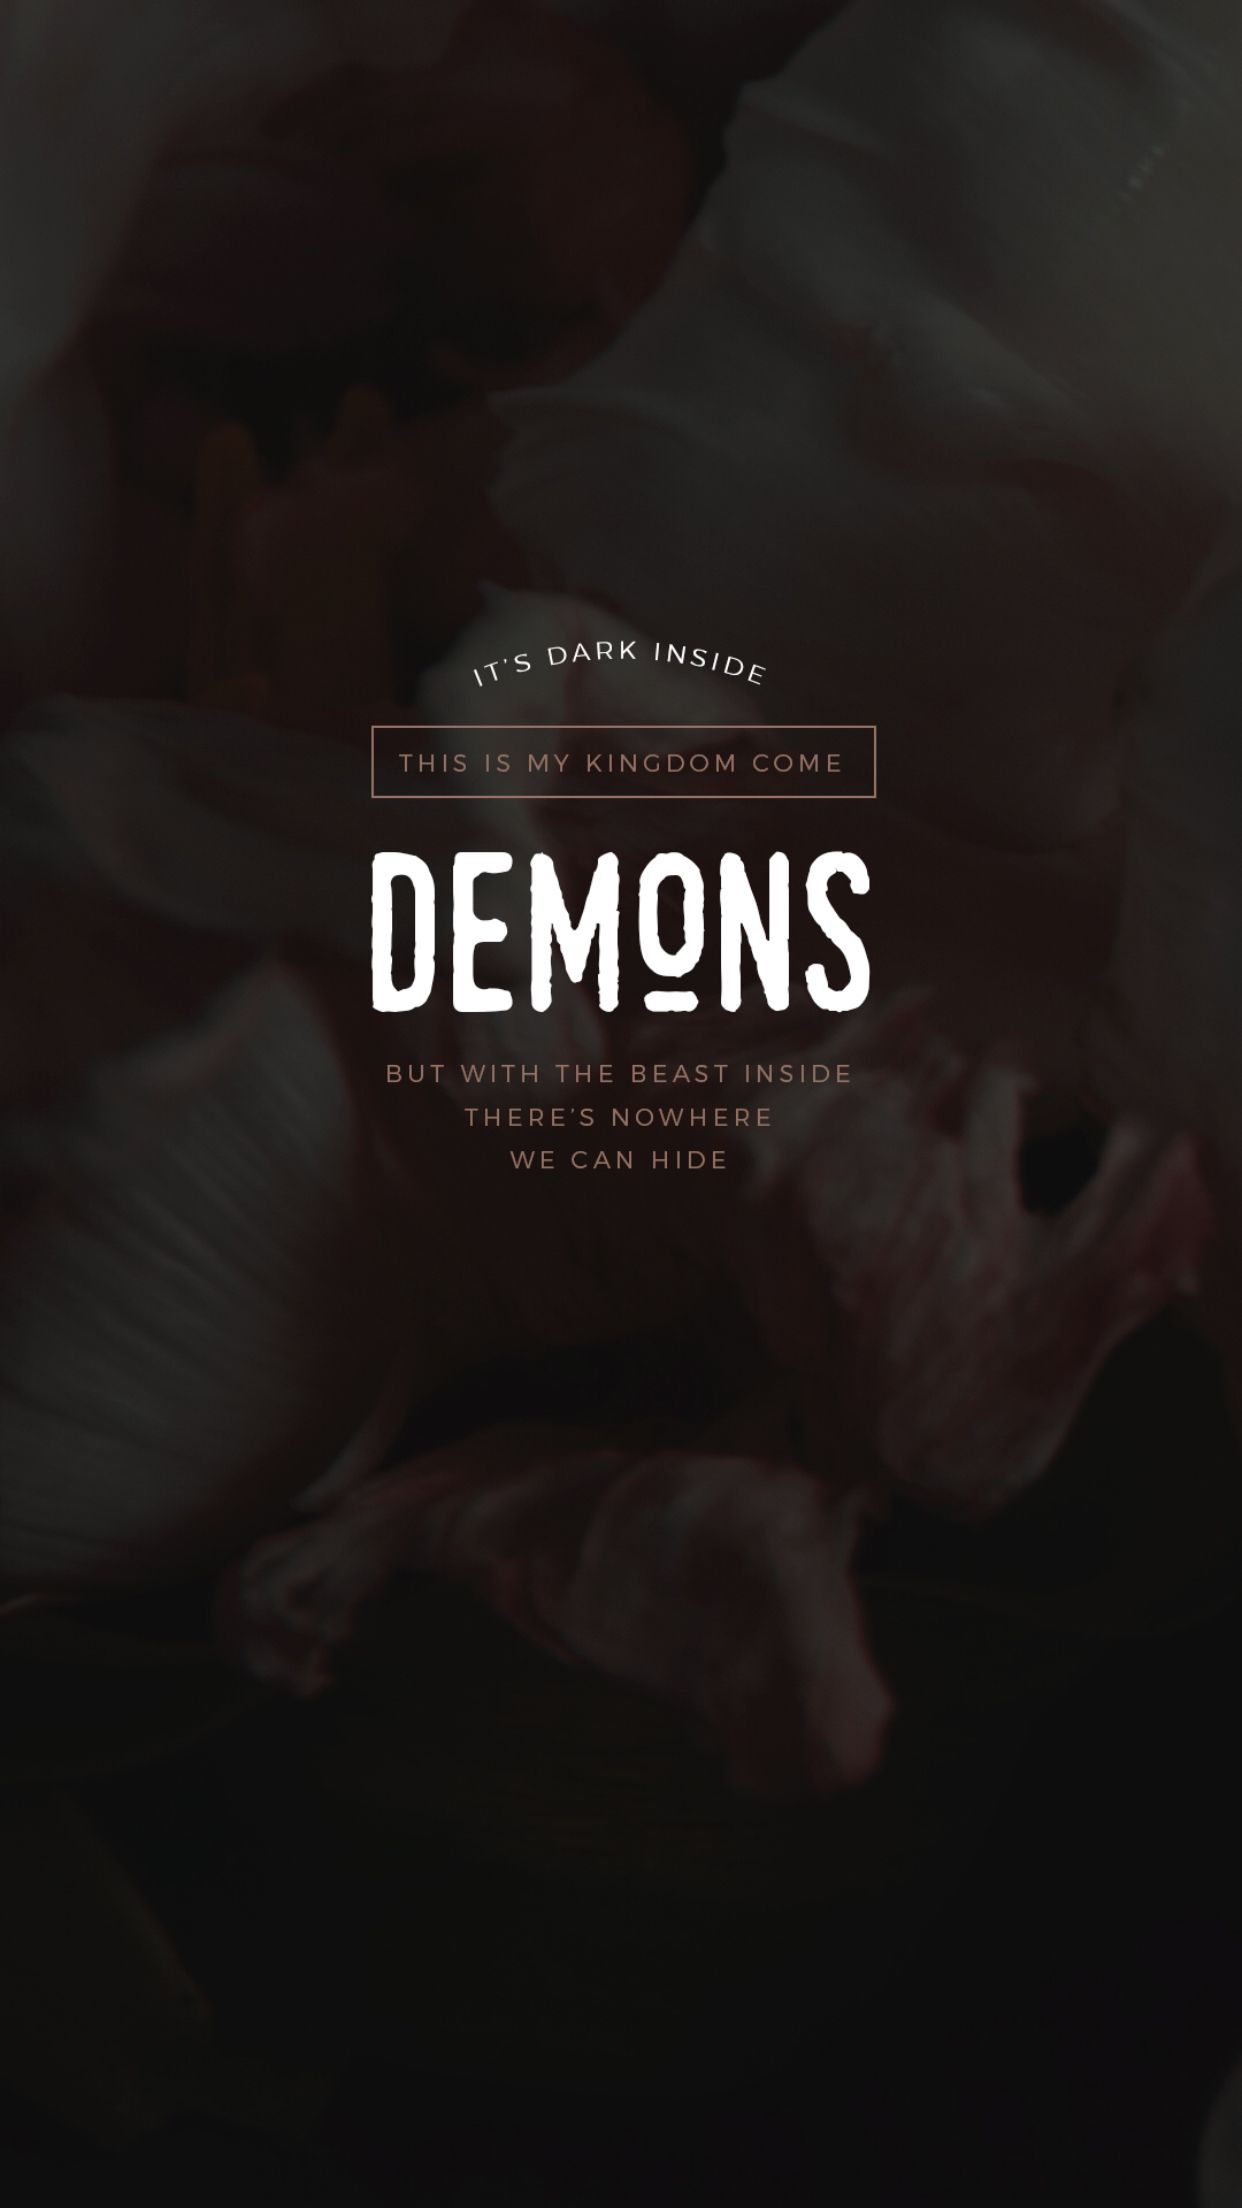 demons lyrics imagine dragons pinterest imagine